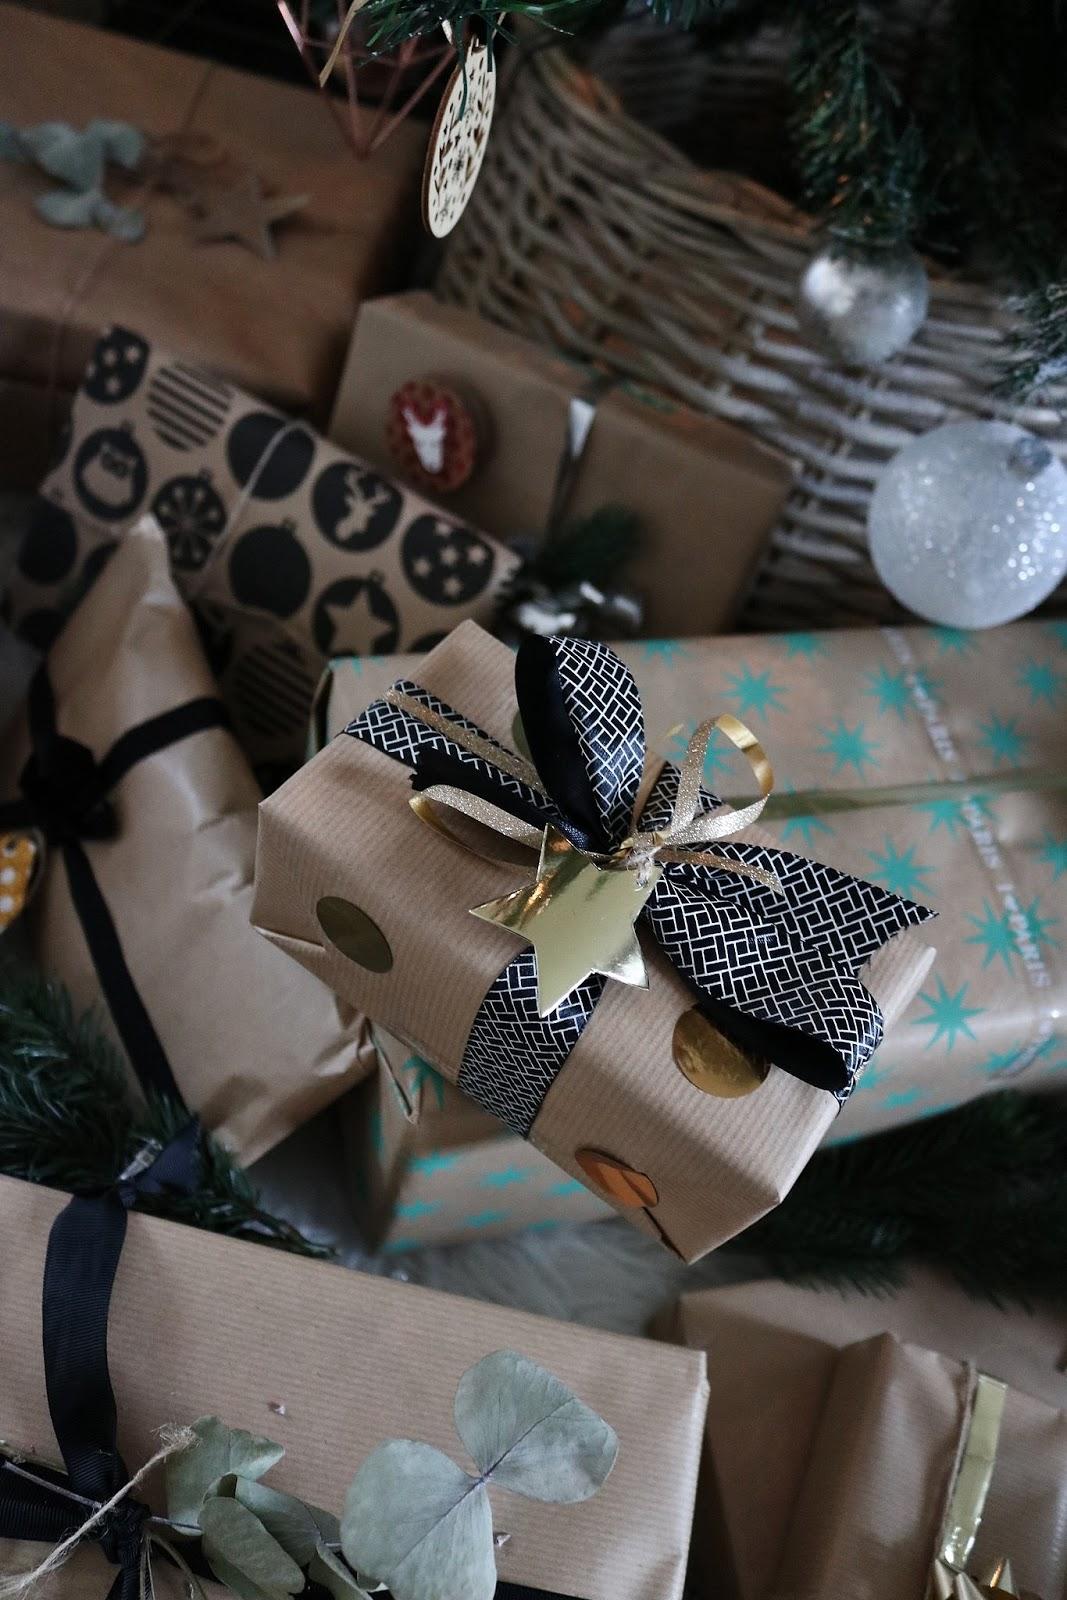 pauline-dress-besancon-noel-emballages-cadeaux-gift-christmas-2017-2018-kraft-nature-sapin-panier-garni-ruban-decore-etoile-dore-or-action-hema